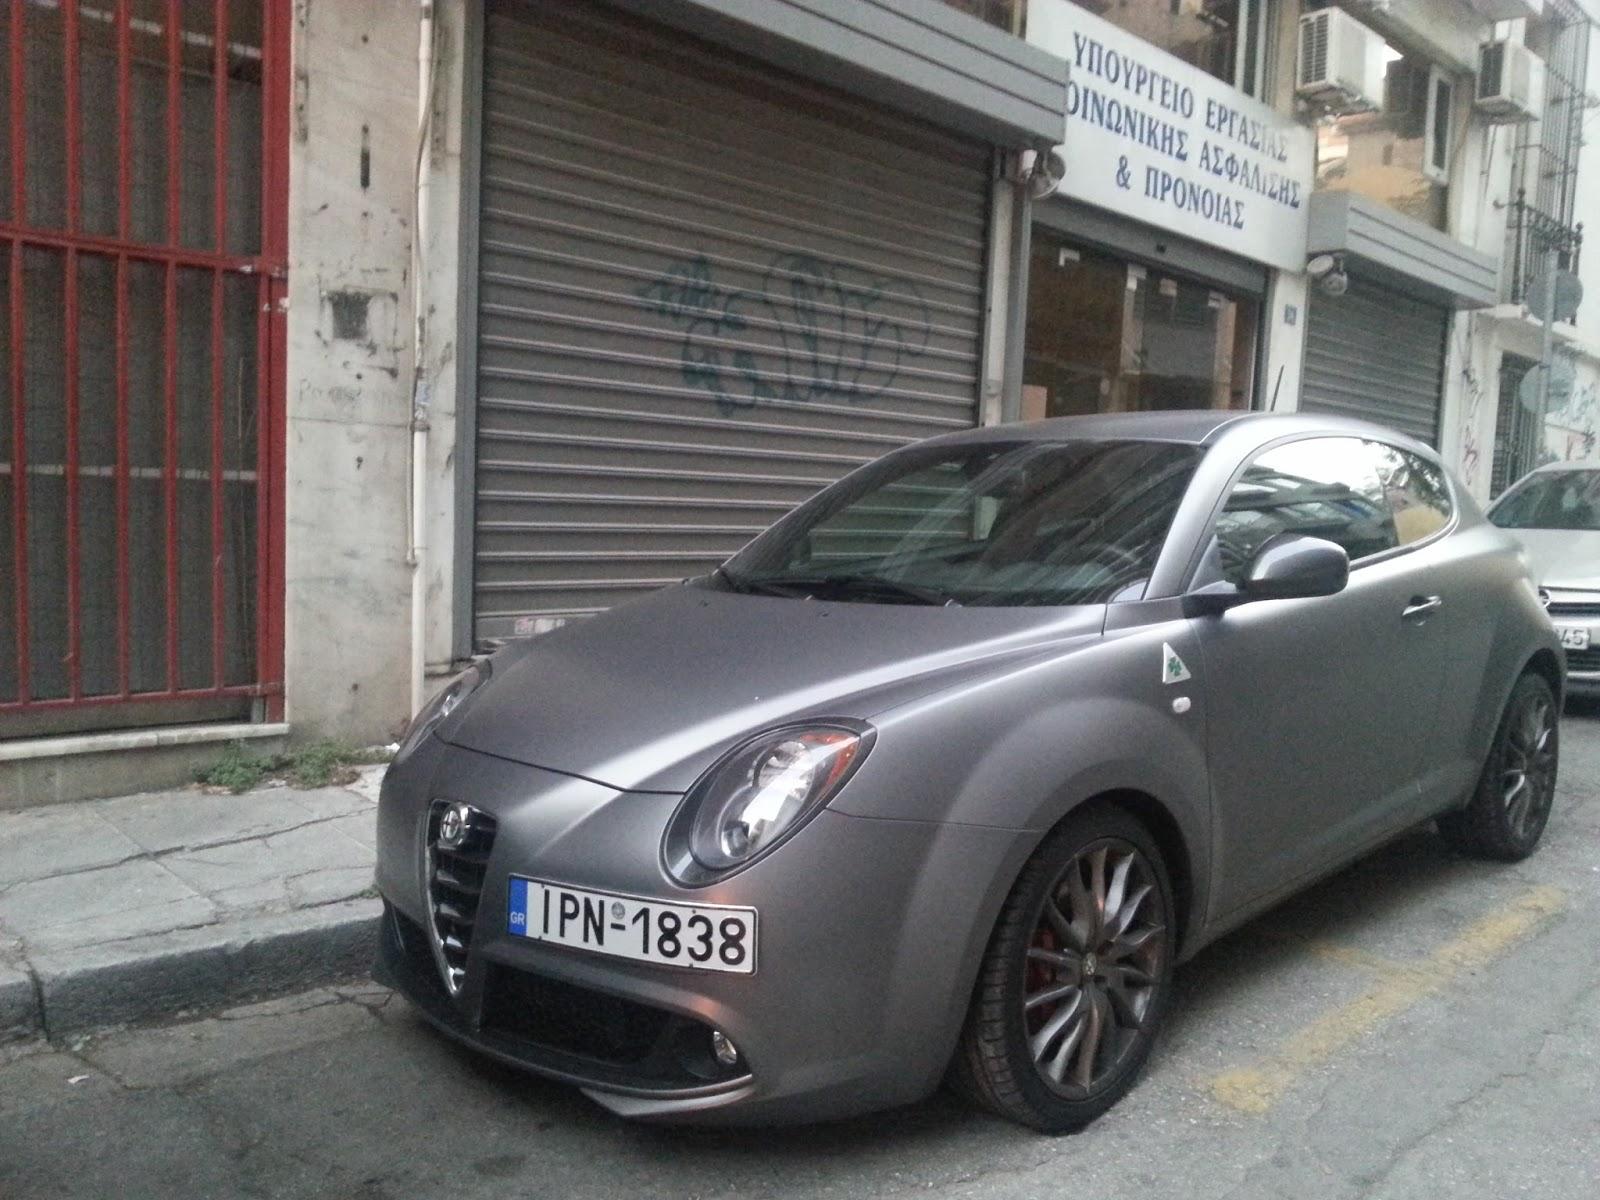 F6 Όταν έλιωσα στο στρίψιμο μια MiTo QV alfa romeo, Alfa Romeo MiTo QV, MiTo QV, zblog, ΔΟΚΙΜΕΣ